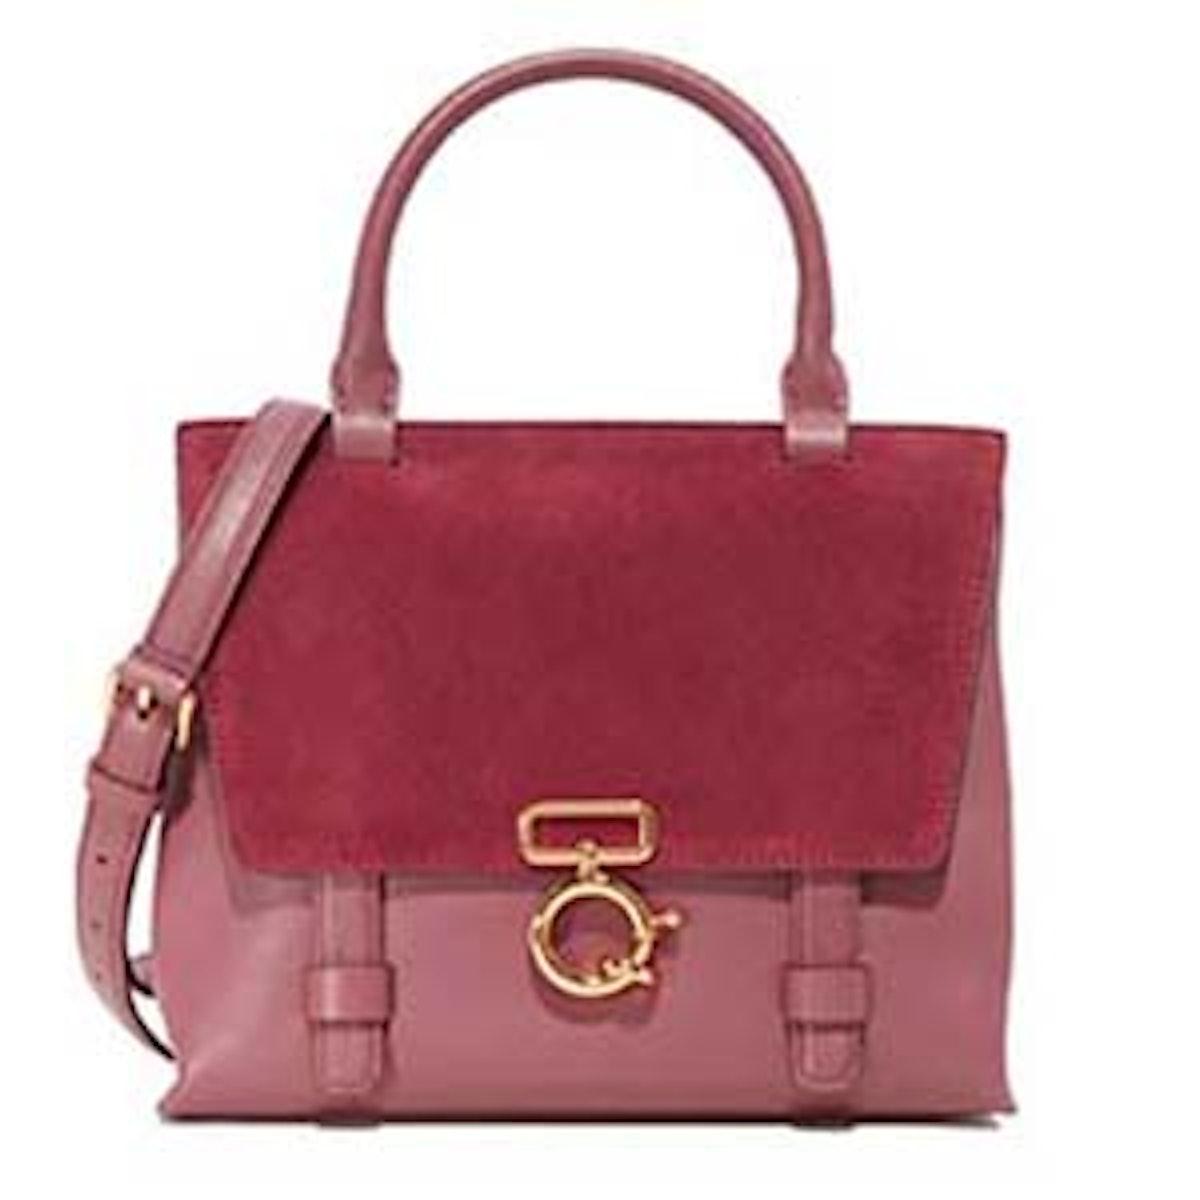 Mini Avenue A Cross Body Bag